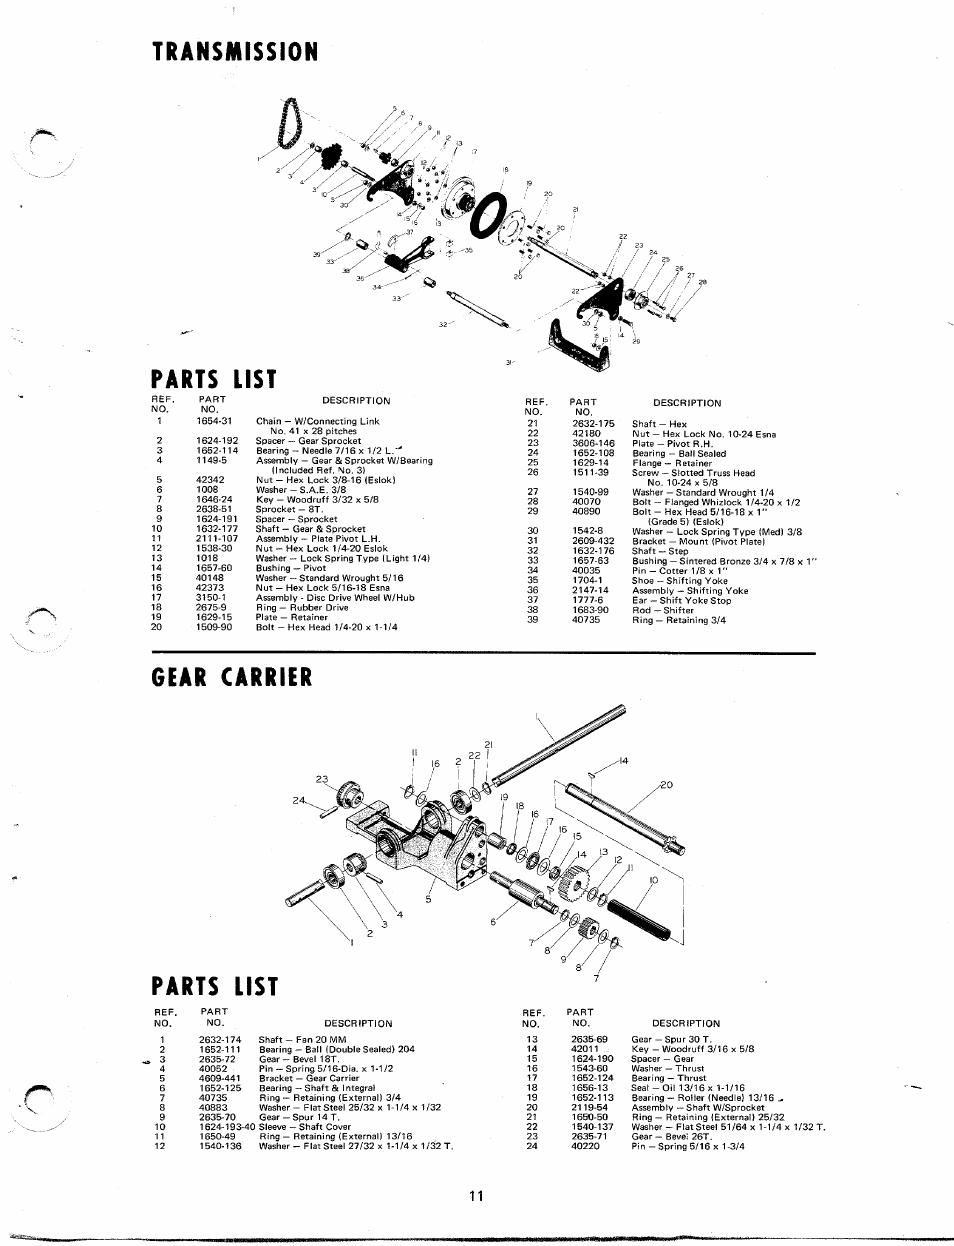 Transmission, Parts list, Gear carrier | Transmission parts list | MTD  Yard-Man